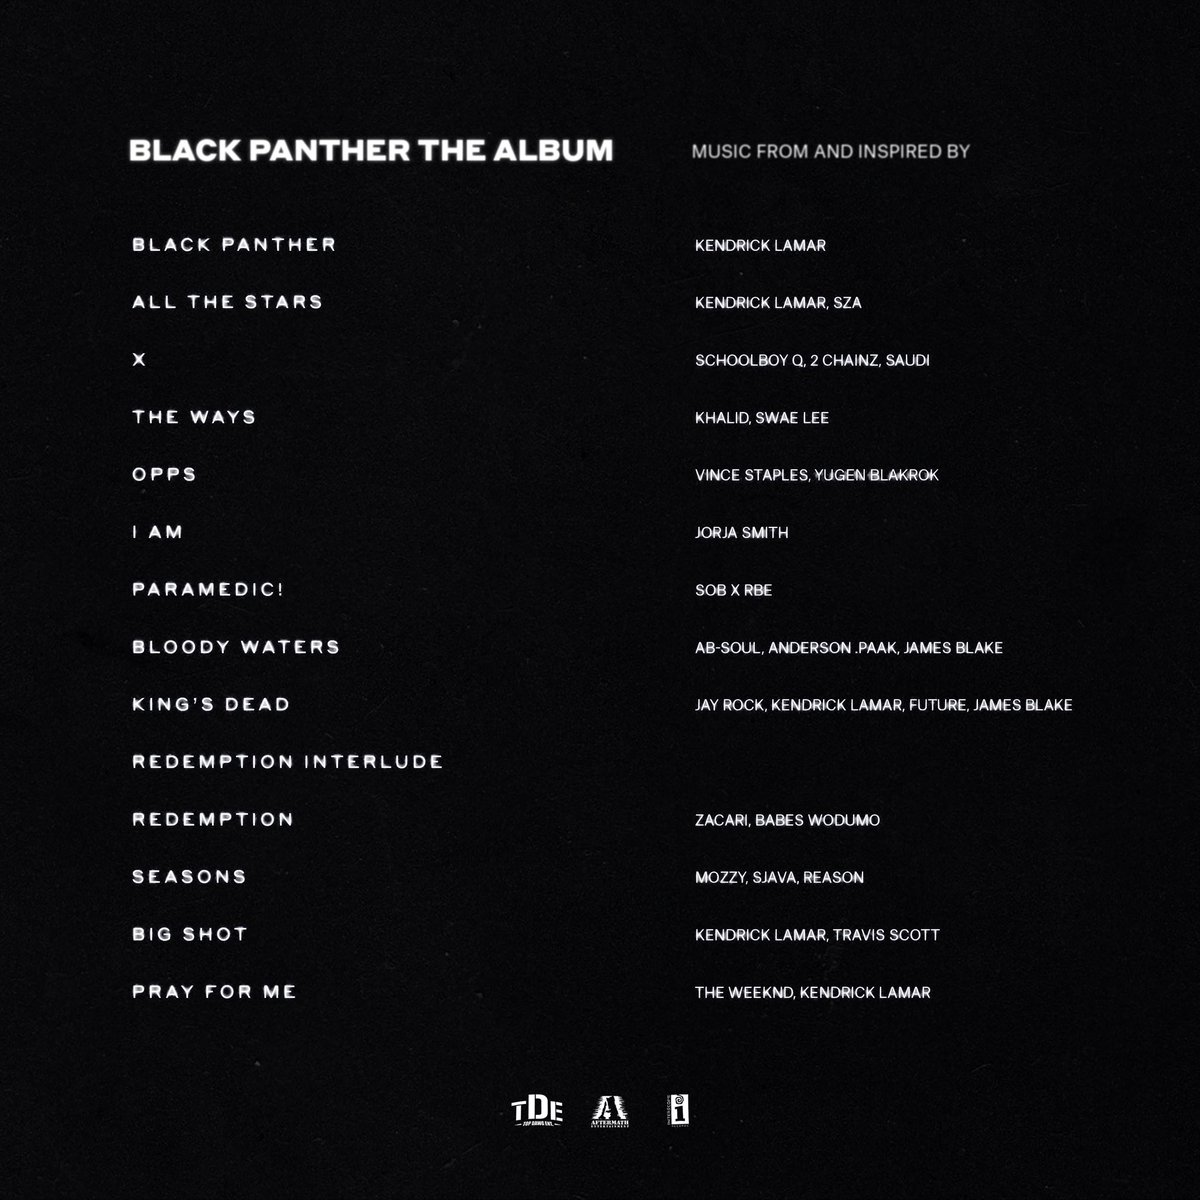 Resultado de imagem para black panther album kendrick lamar